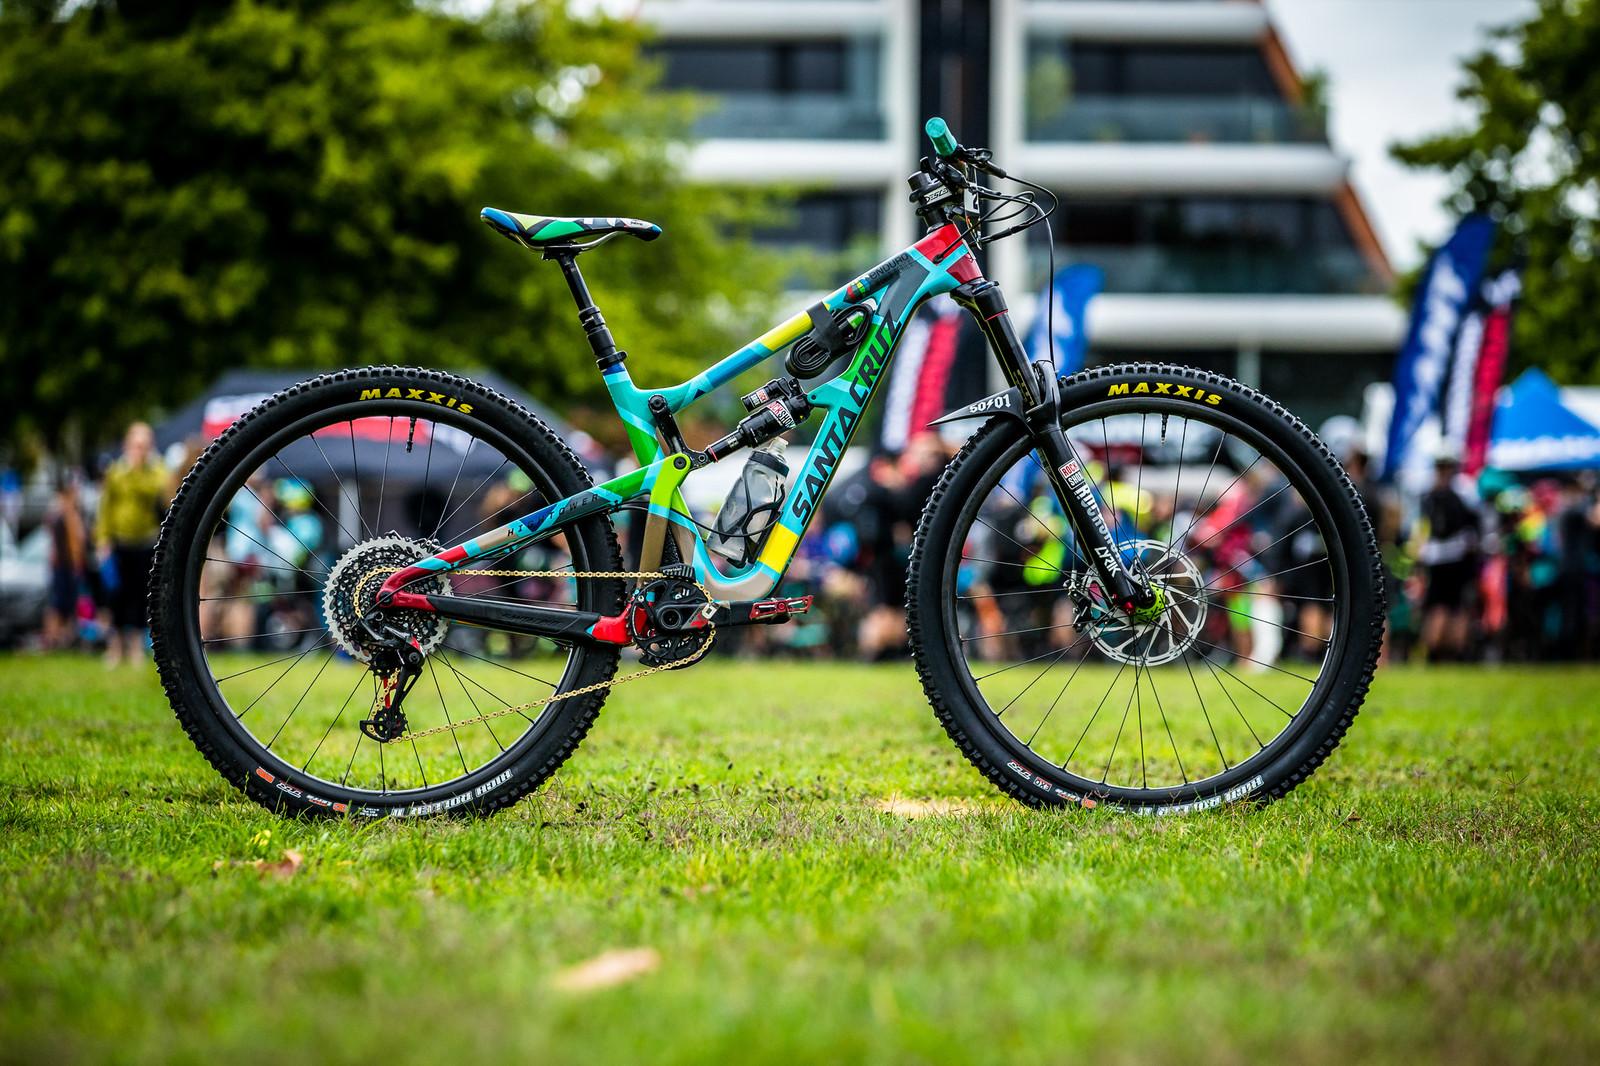 Iago Garay's Santa Cruz Hightower - PIT BITS - Enduro World Series, Rotorua, New Zealand - Mountain Biking Pictures - Vital MTB